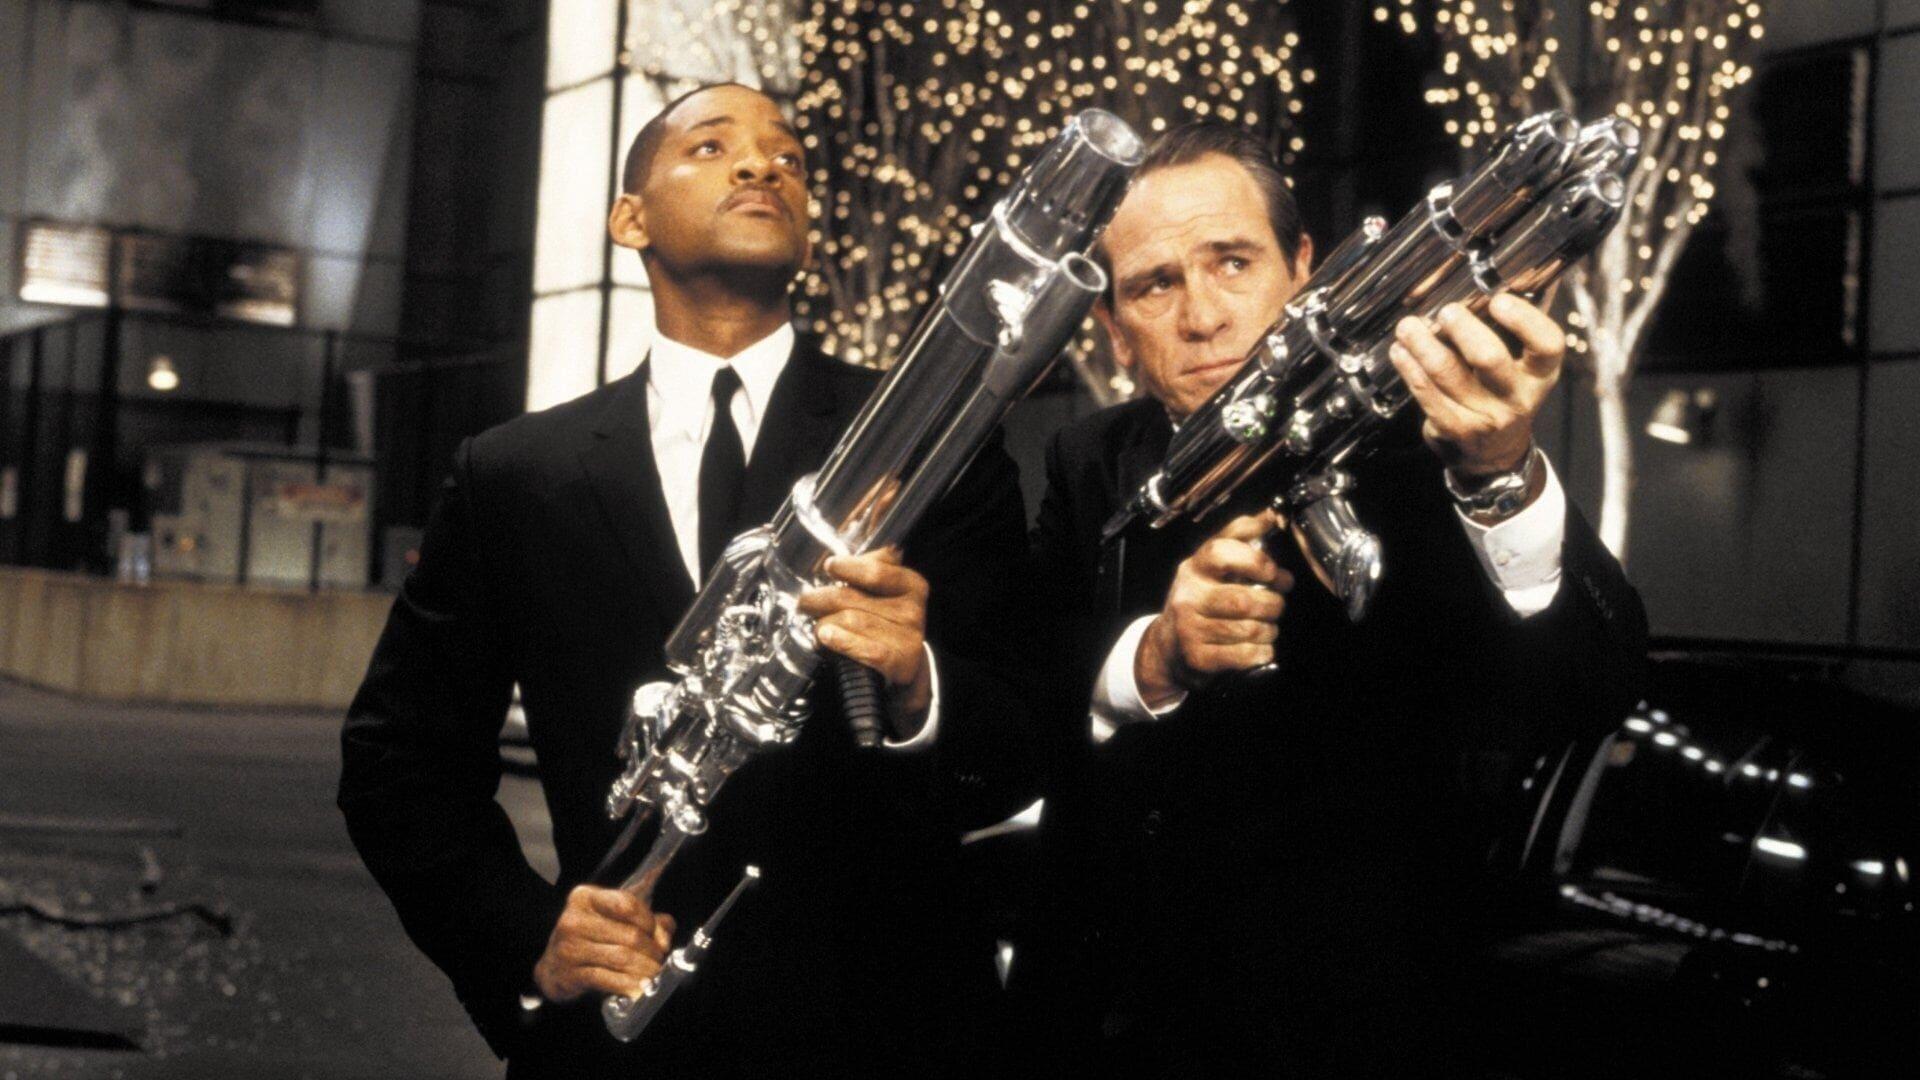 Men in Black II (2002)